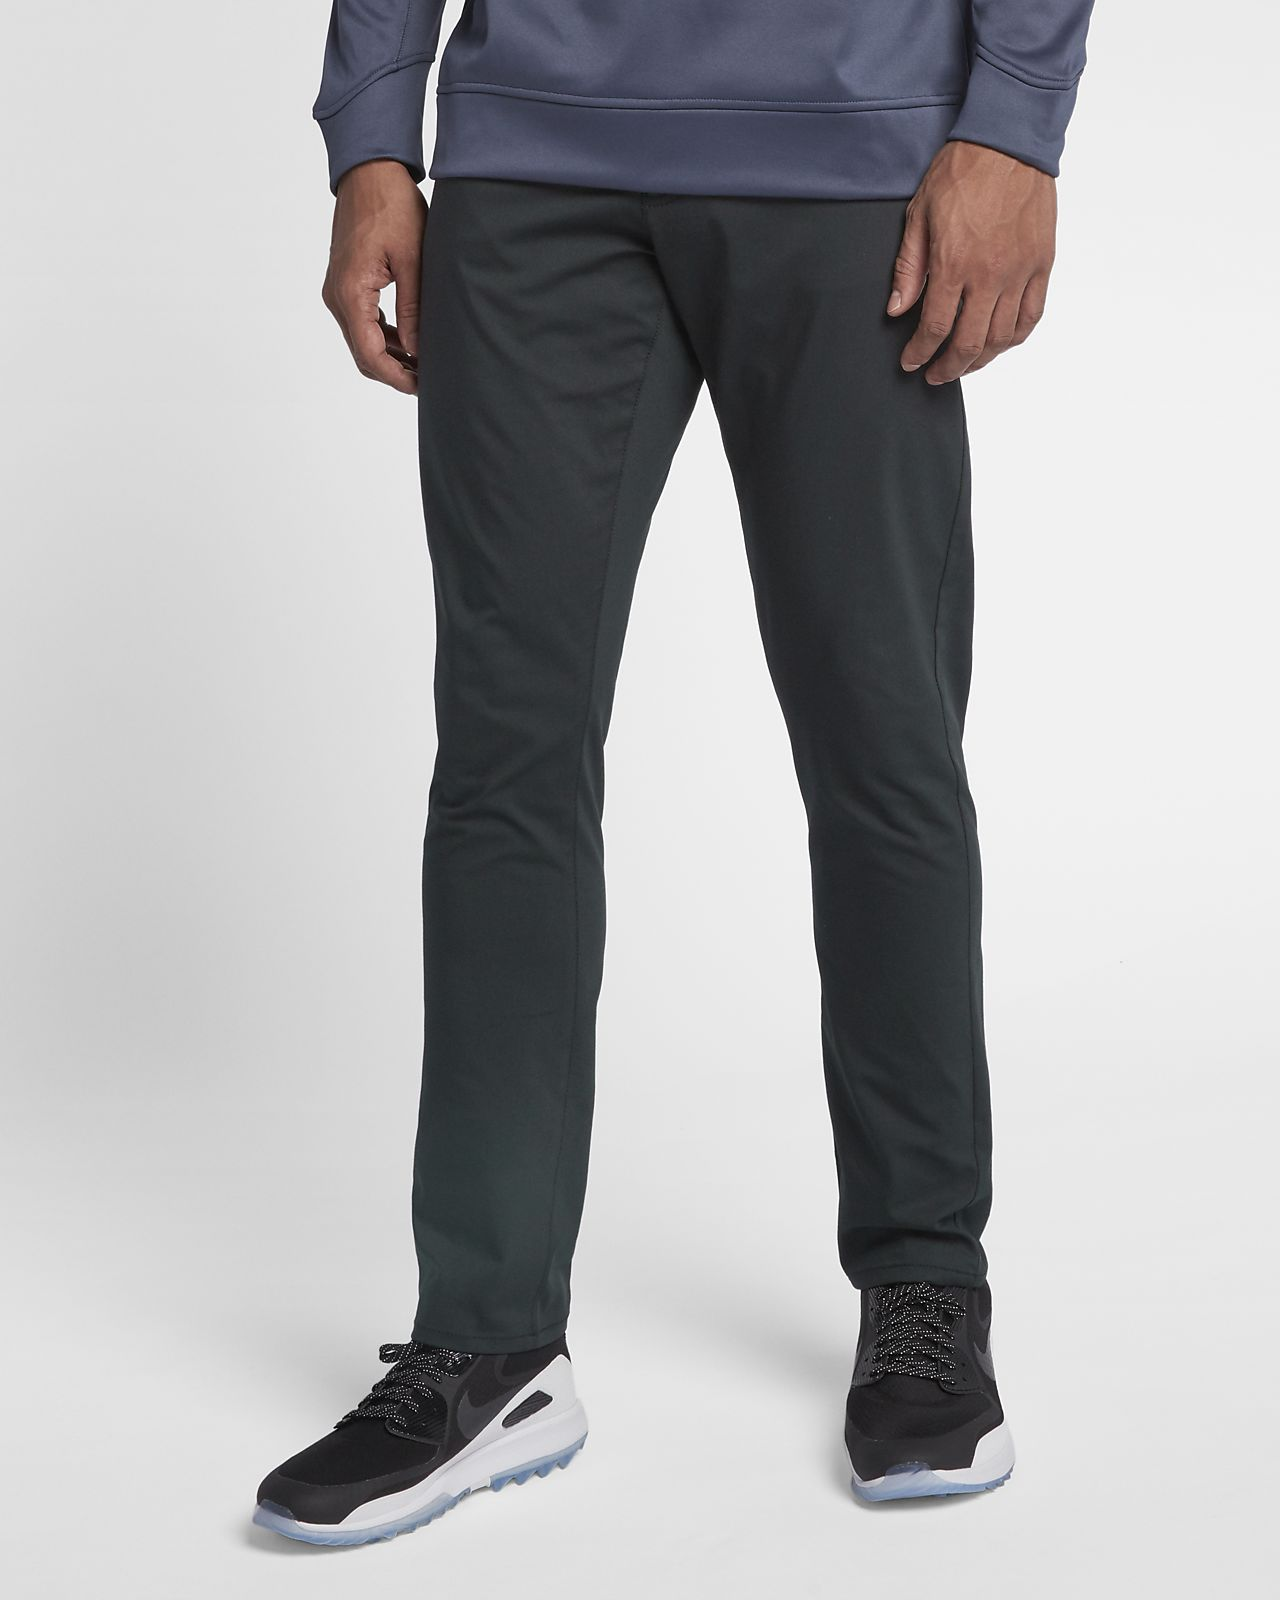 Nike Flex 5 Pocket Pantalons de golf amb ajust entallat - Home